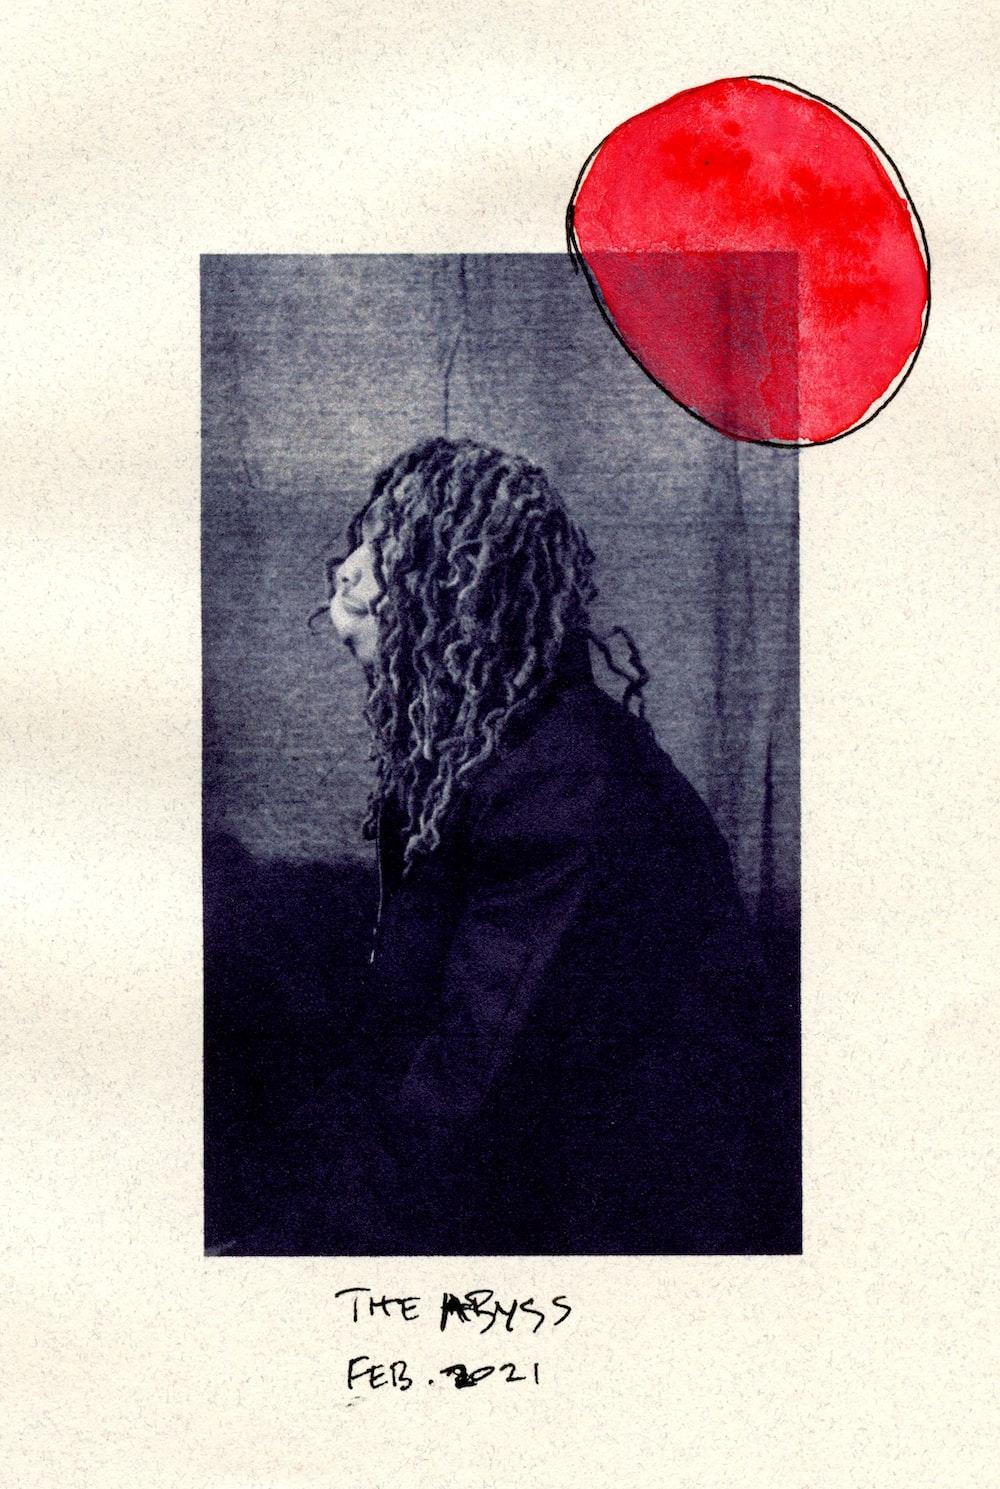 woman in black coat grayscale photo